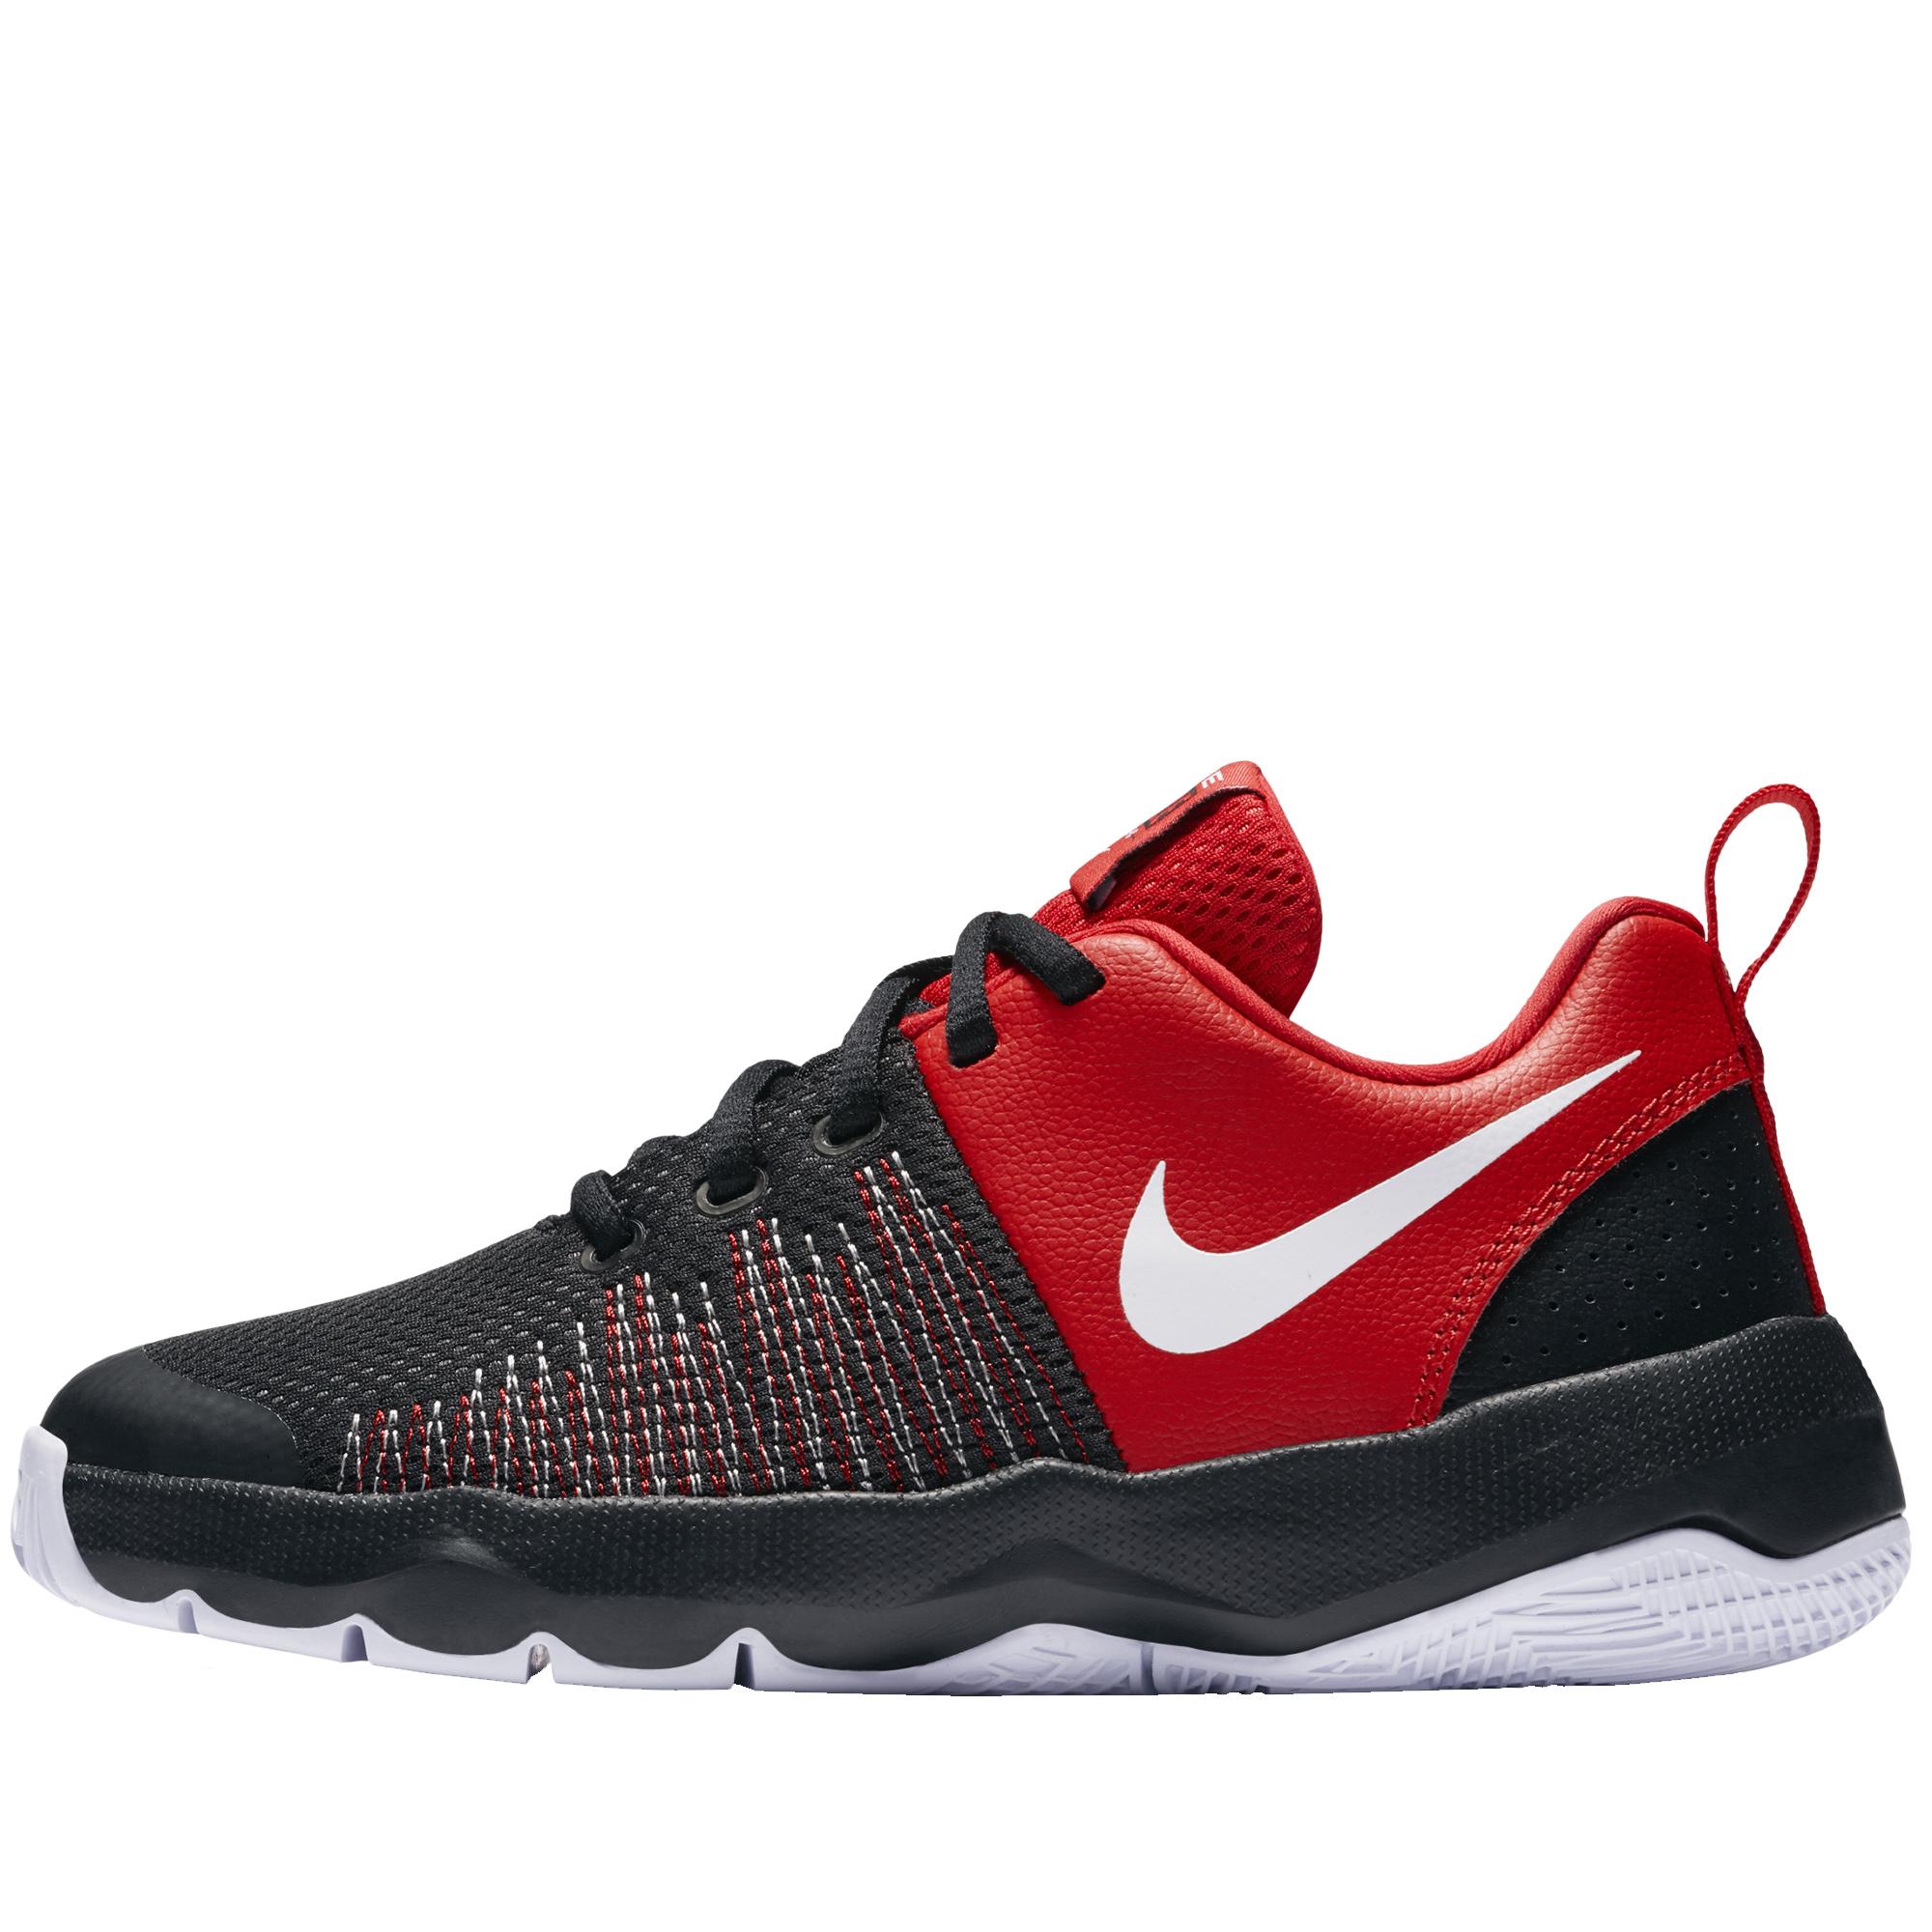 b078f4f1adab2 Nike Team Hustle Quick, červené | Športové oblečenie a športové ...